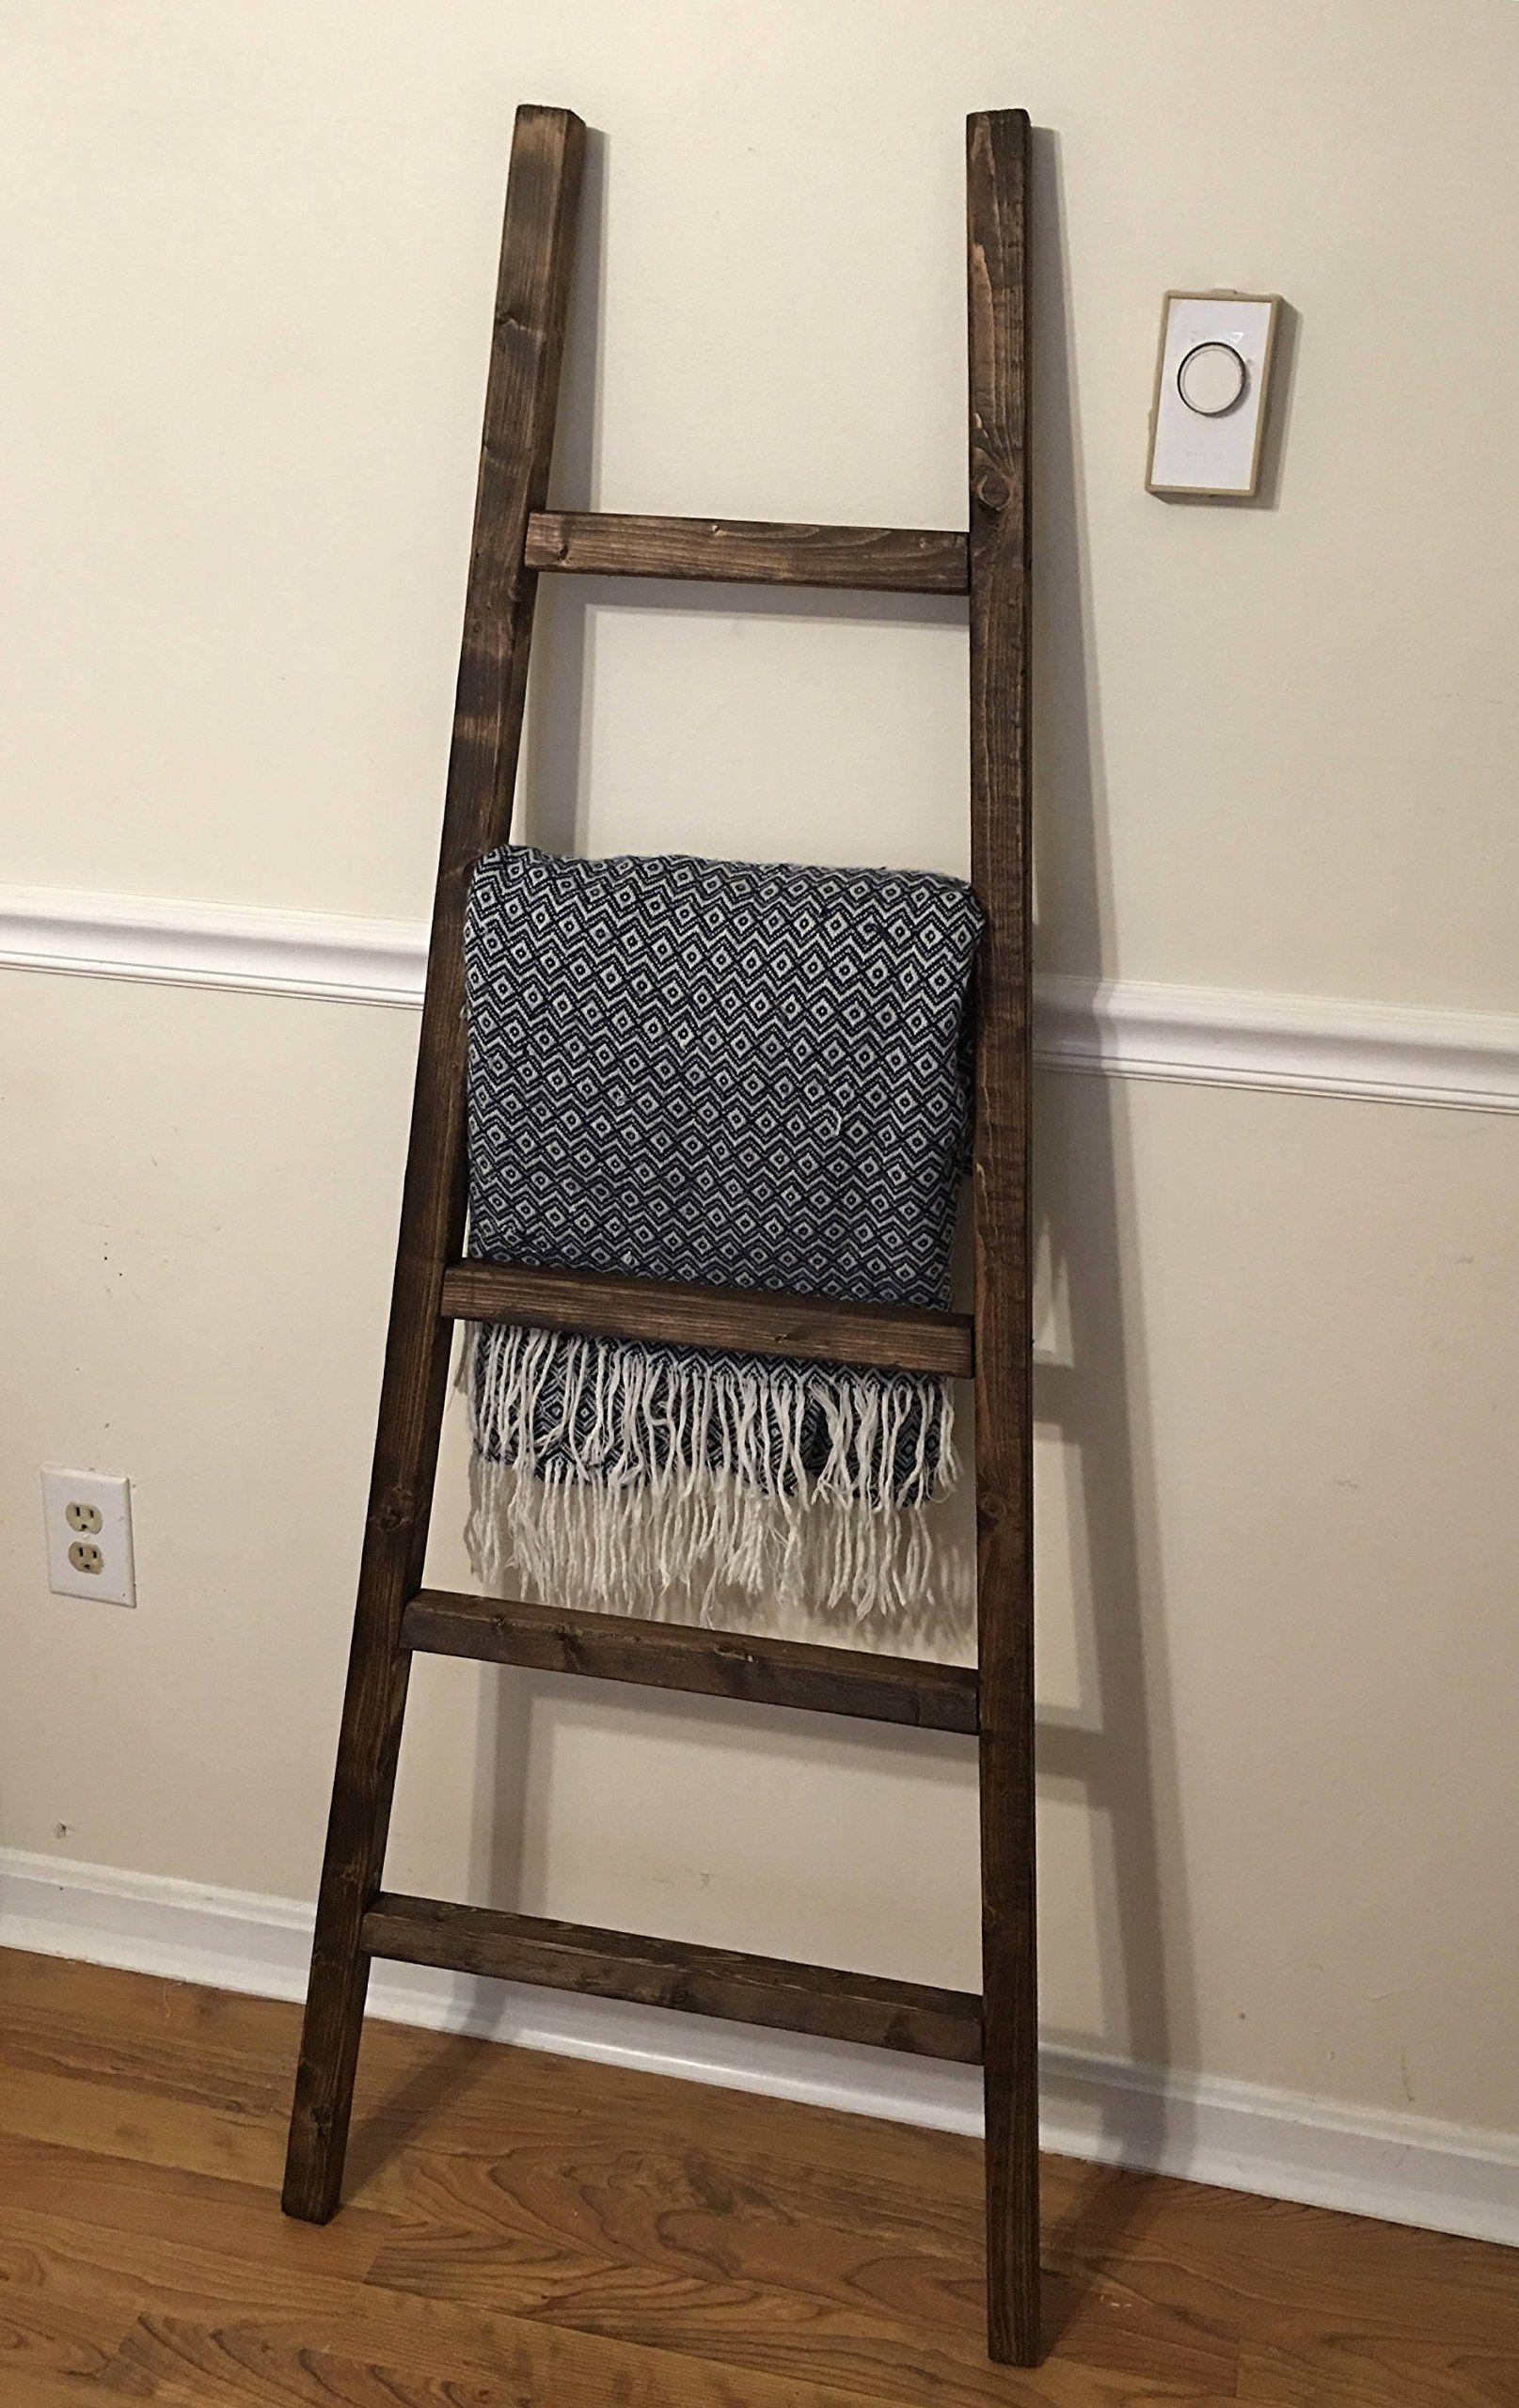 Rustic Ladder 60 Blanket Ladder Quilt Rack Leaning Ladder Towel Rack Pot Rack Reclaimed Wood Handmade Rustic Ladder Rustic Blanket Ladder Quilt Rack